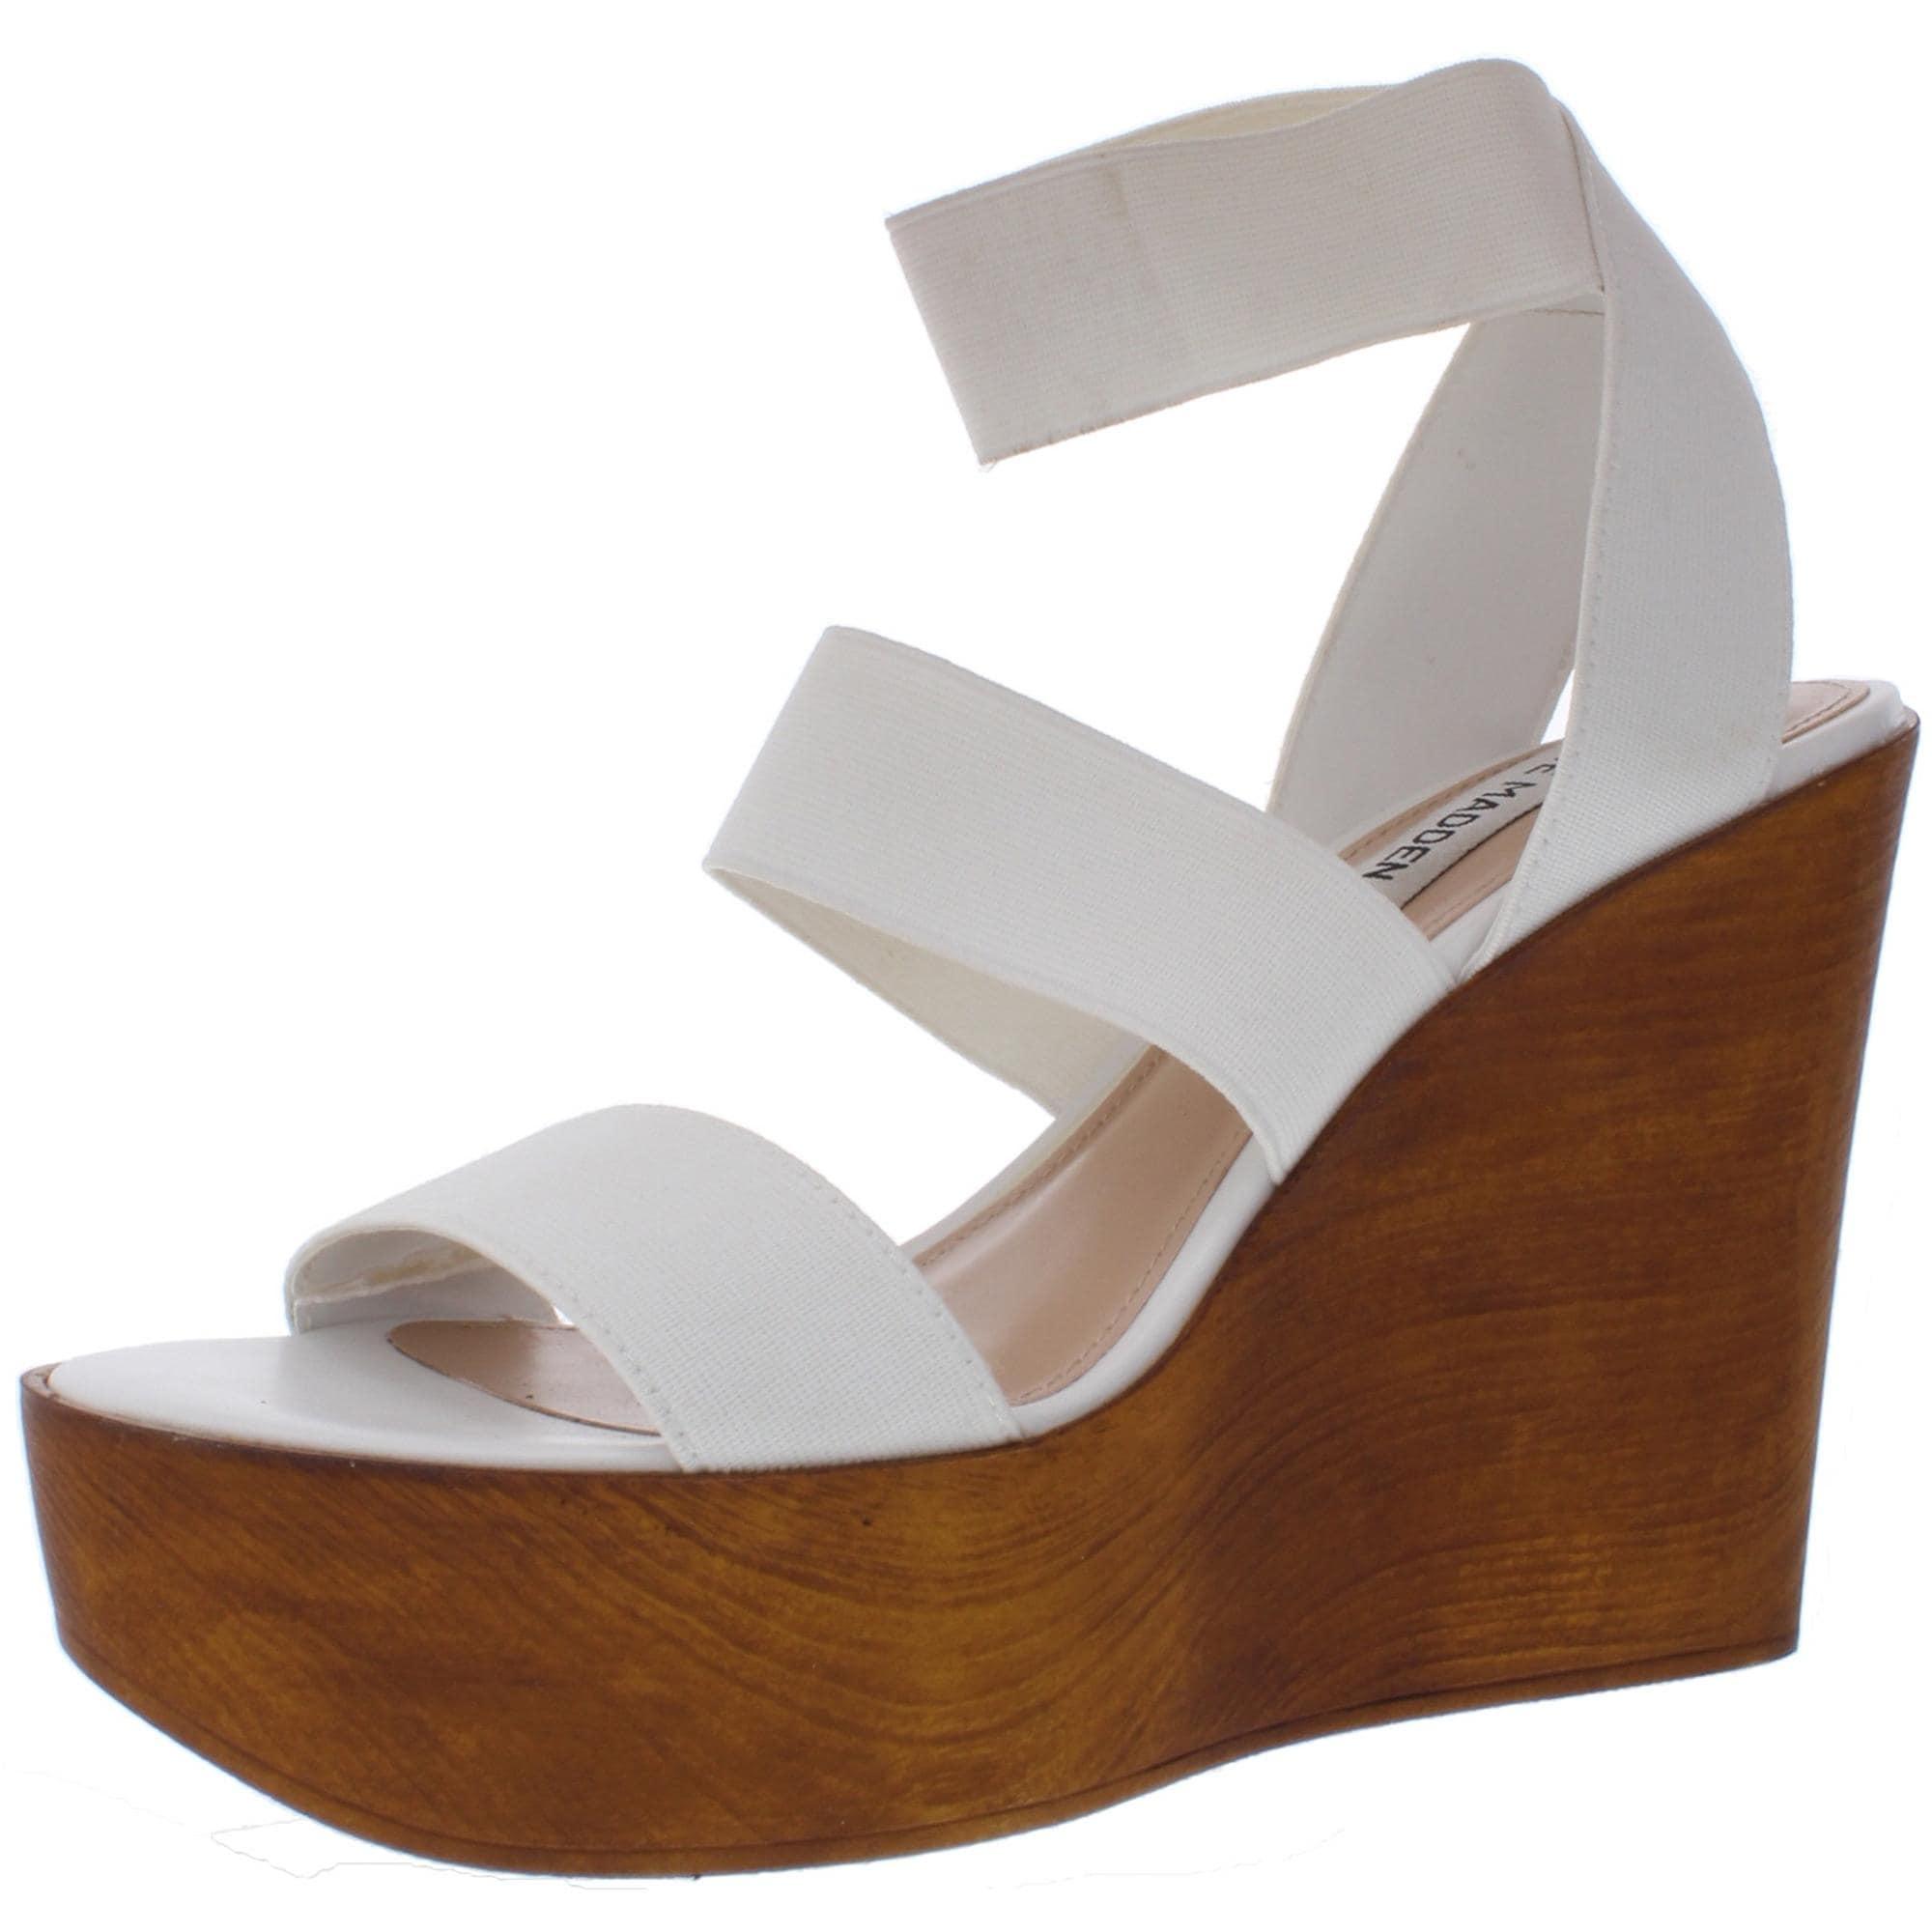 obispo pobreza papel  Steve Madden Womens Blondy Wedge Sandals Platform Wood - Overstock -  27592815